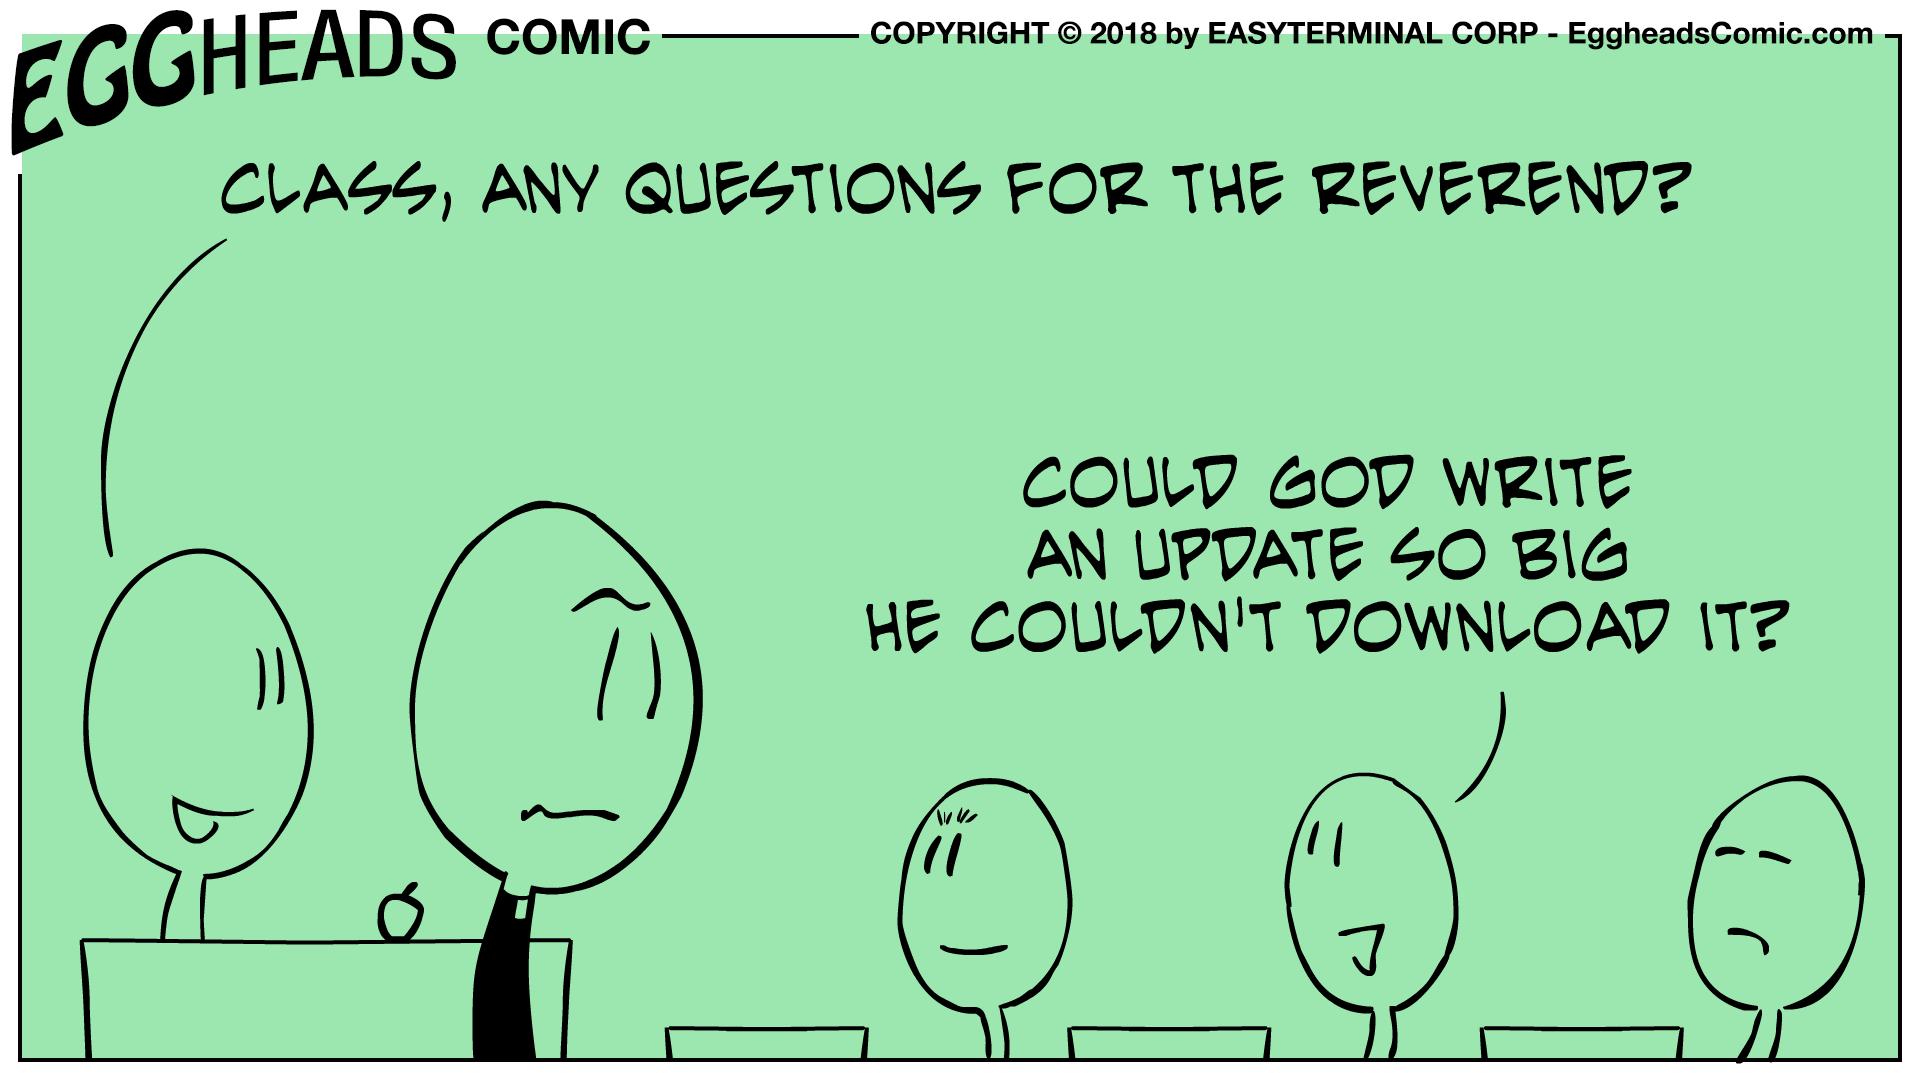 Webcomic Eggheads Comic Strip 073 The Reverend